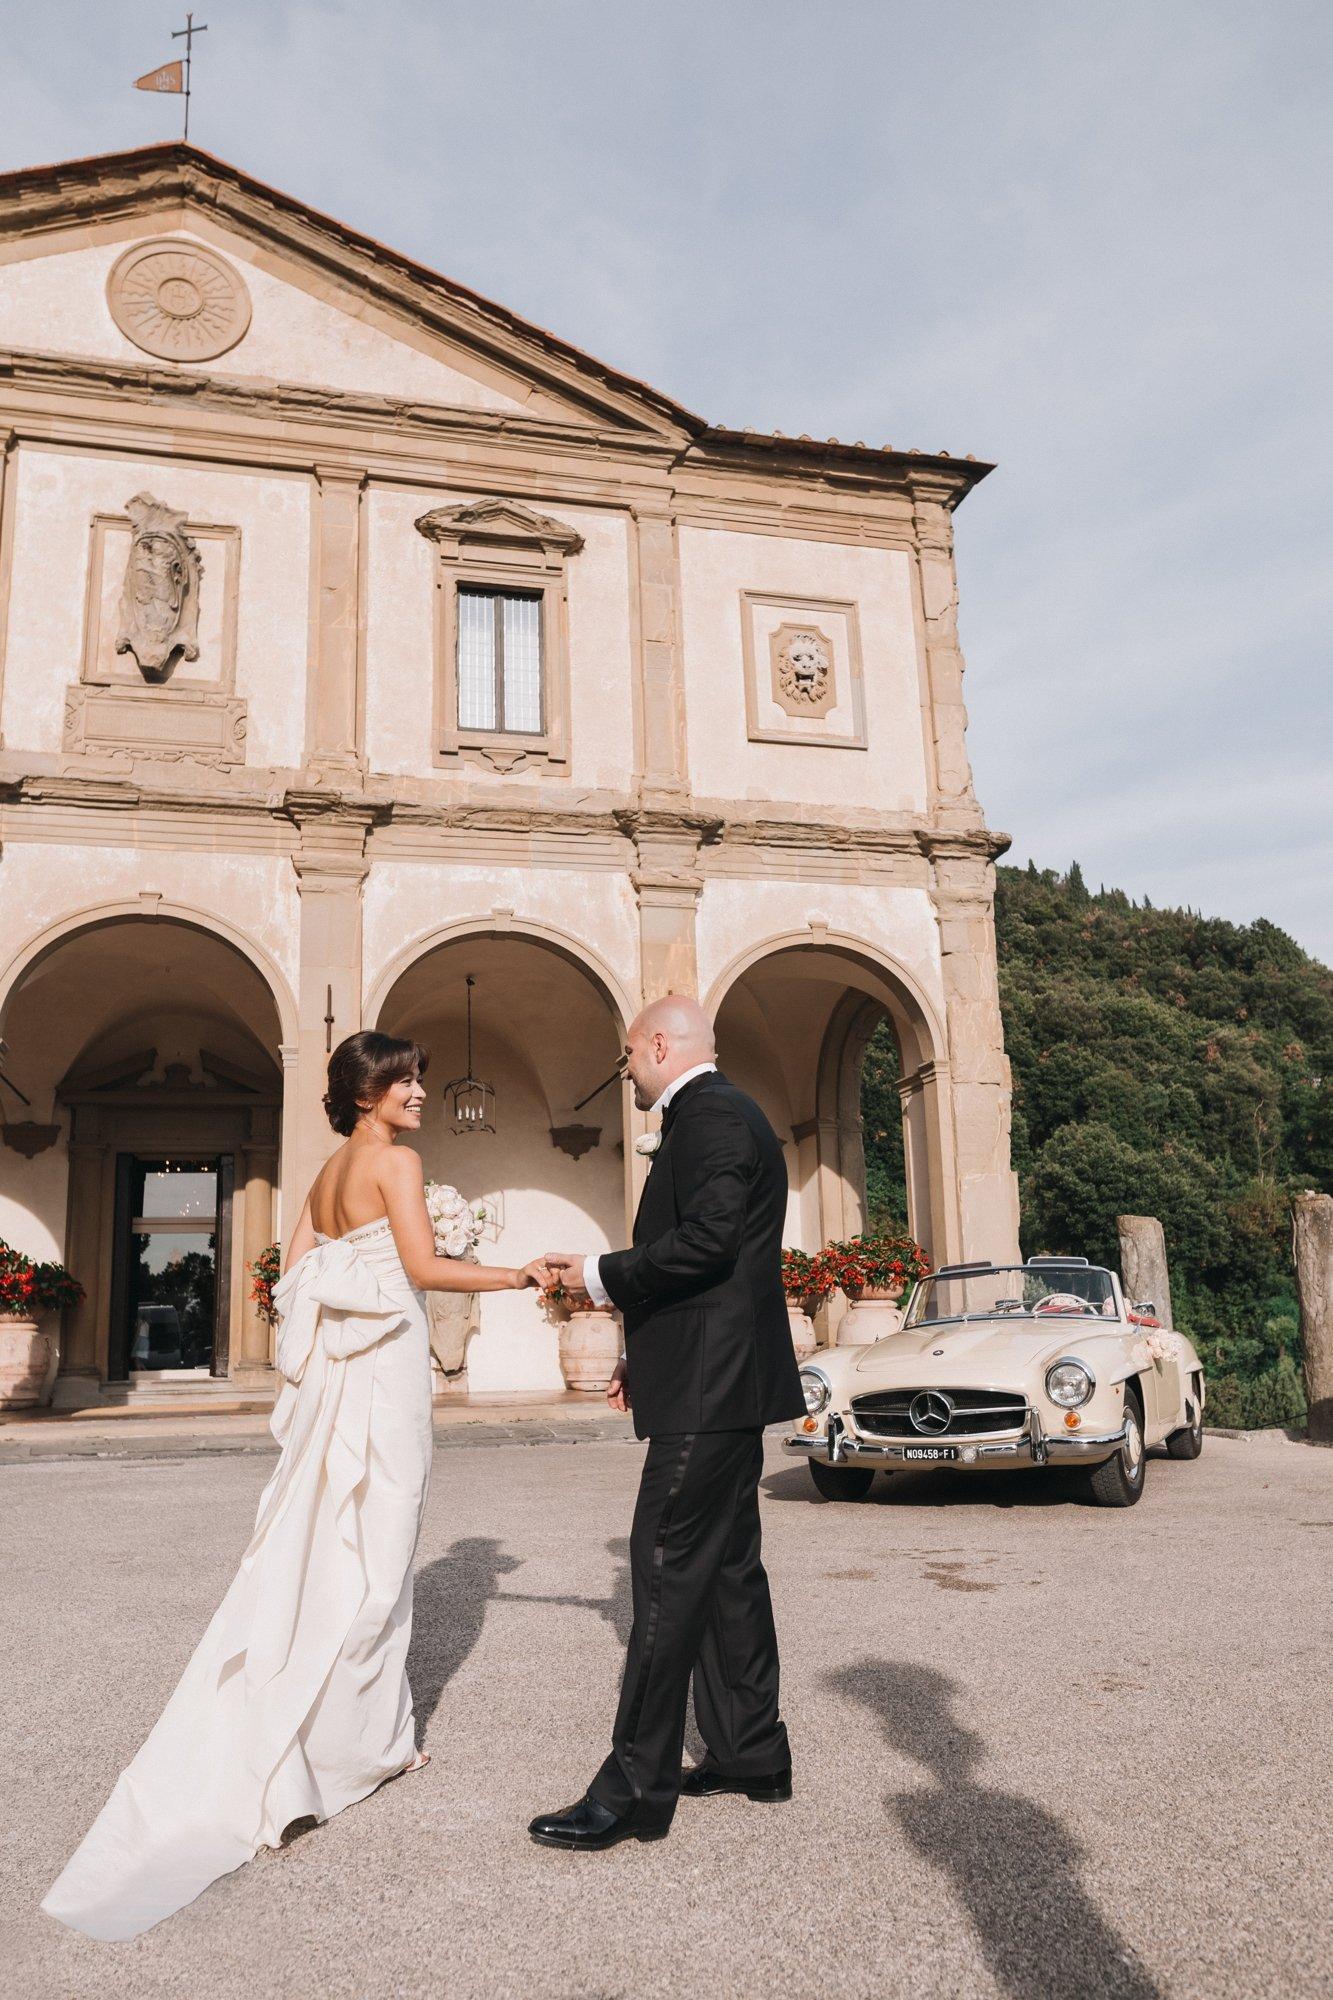 Aika Vadim July 24 2016 Florence Italy-Shooting-0015.jpg